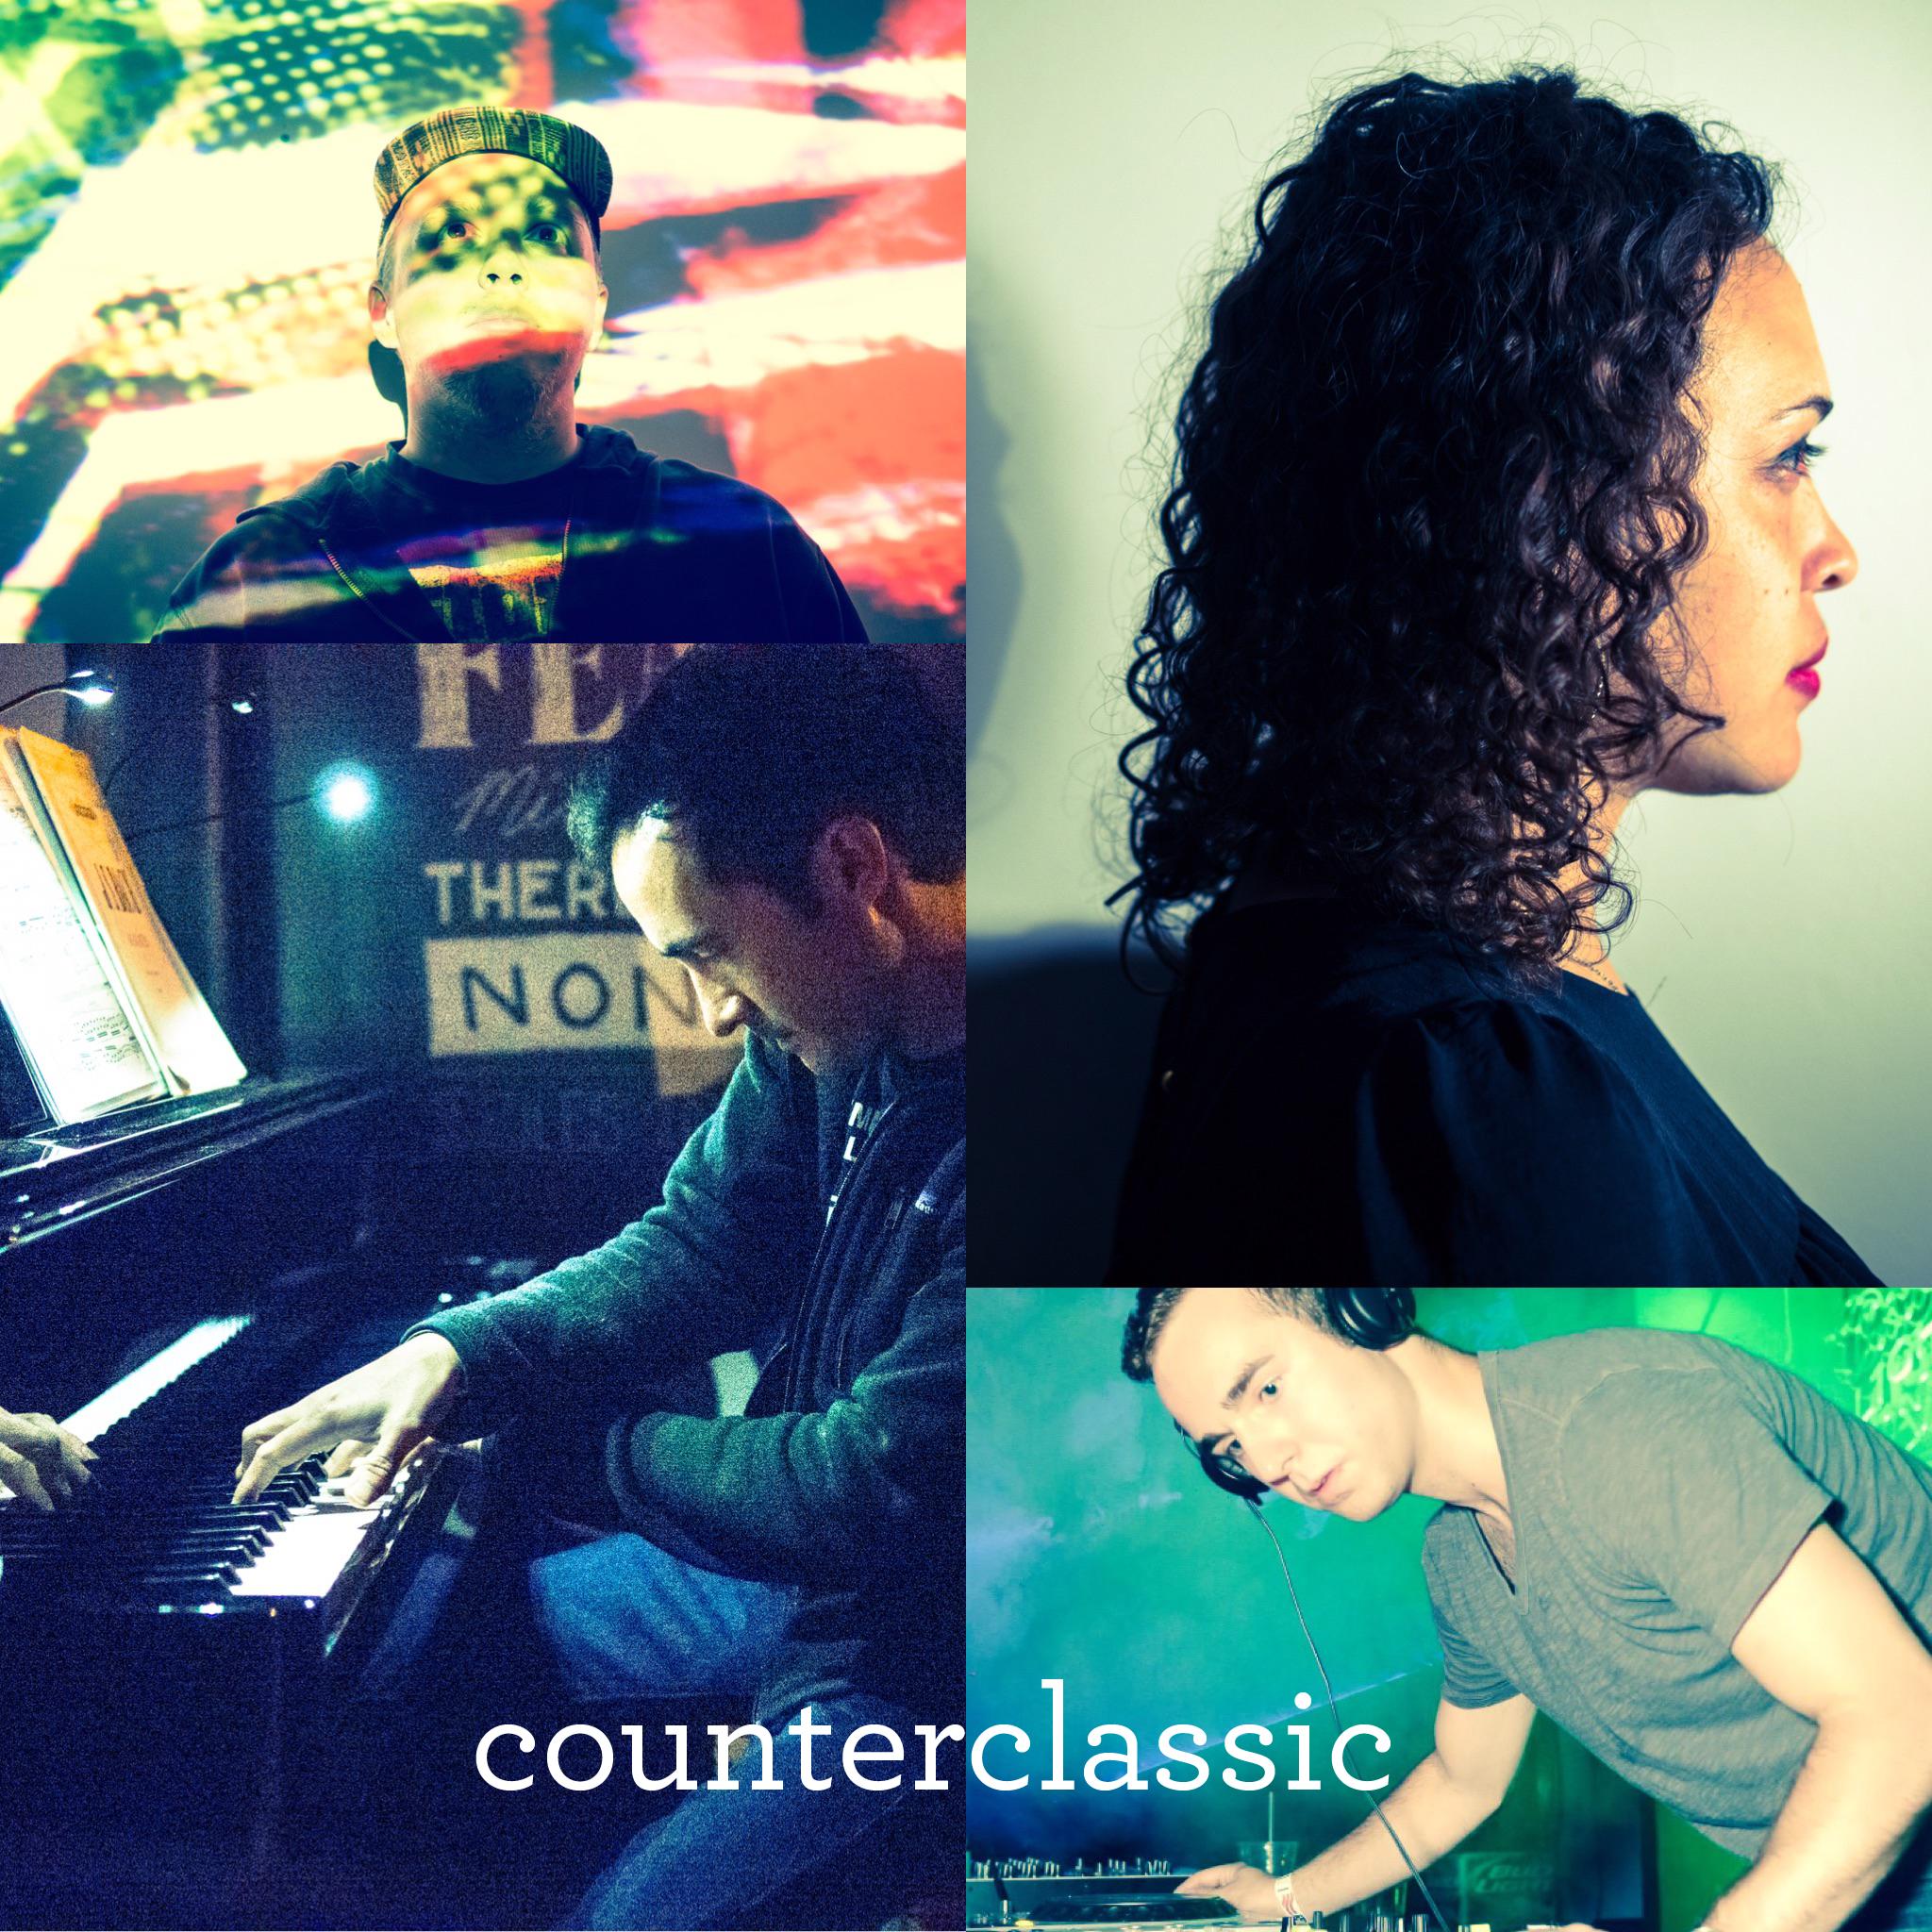 Piano: Christopher Astilla + Flute: Sofia Hailu +  VIsual Artist: Michael Pino + DJ Blinkhorn